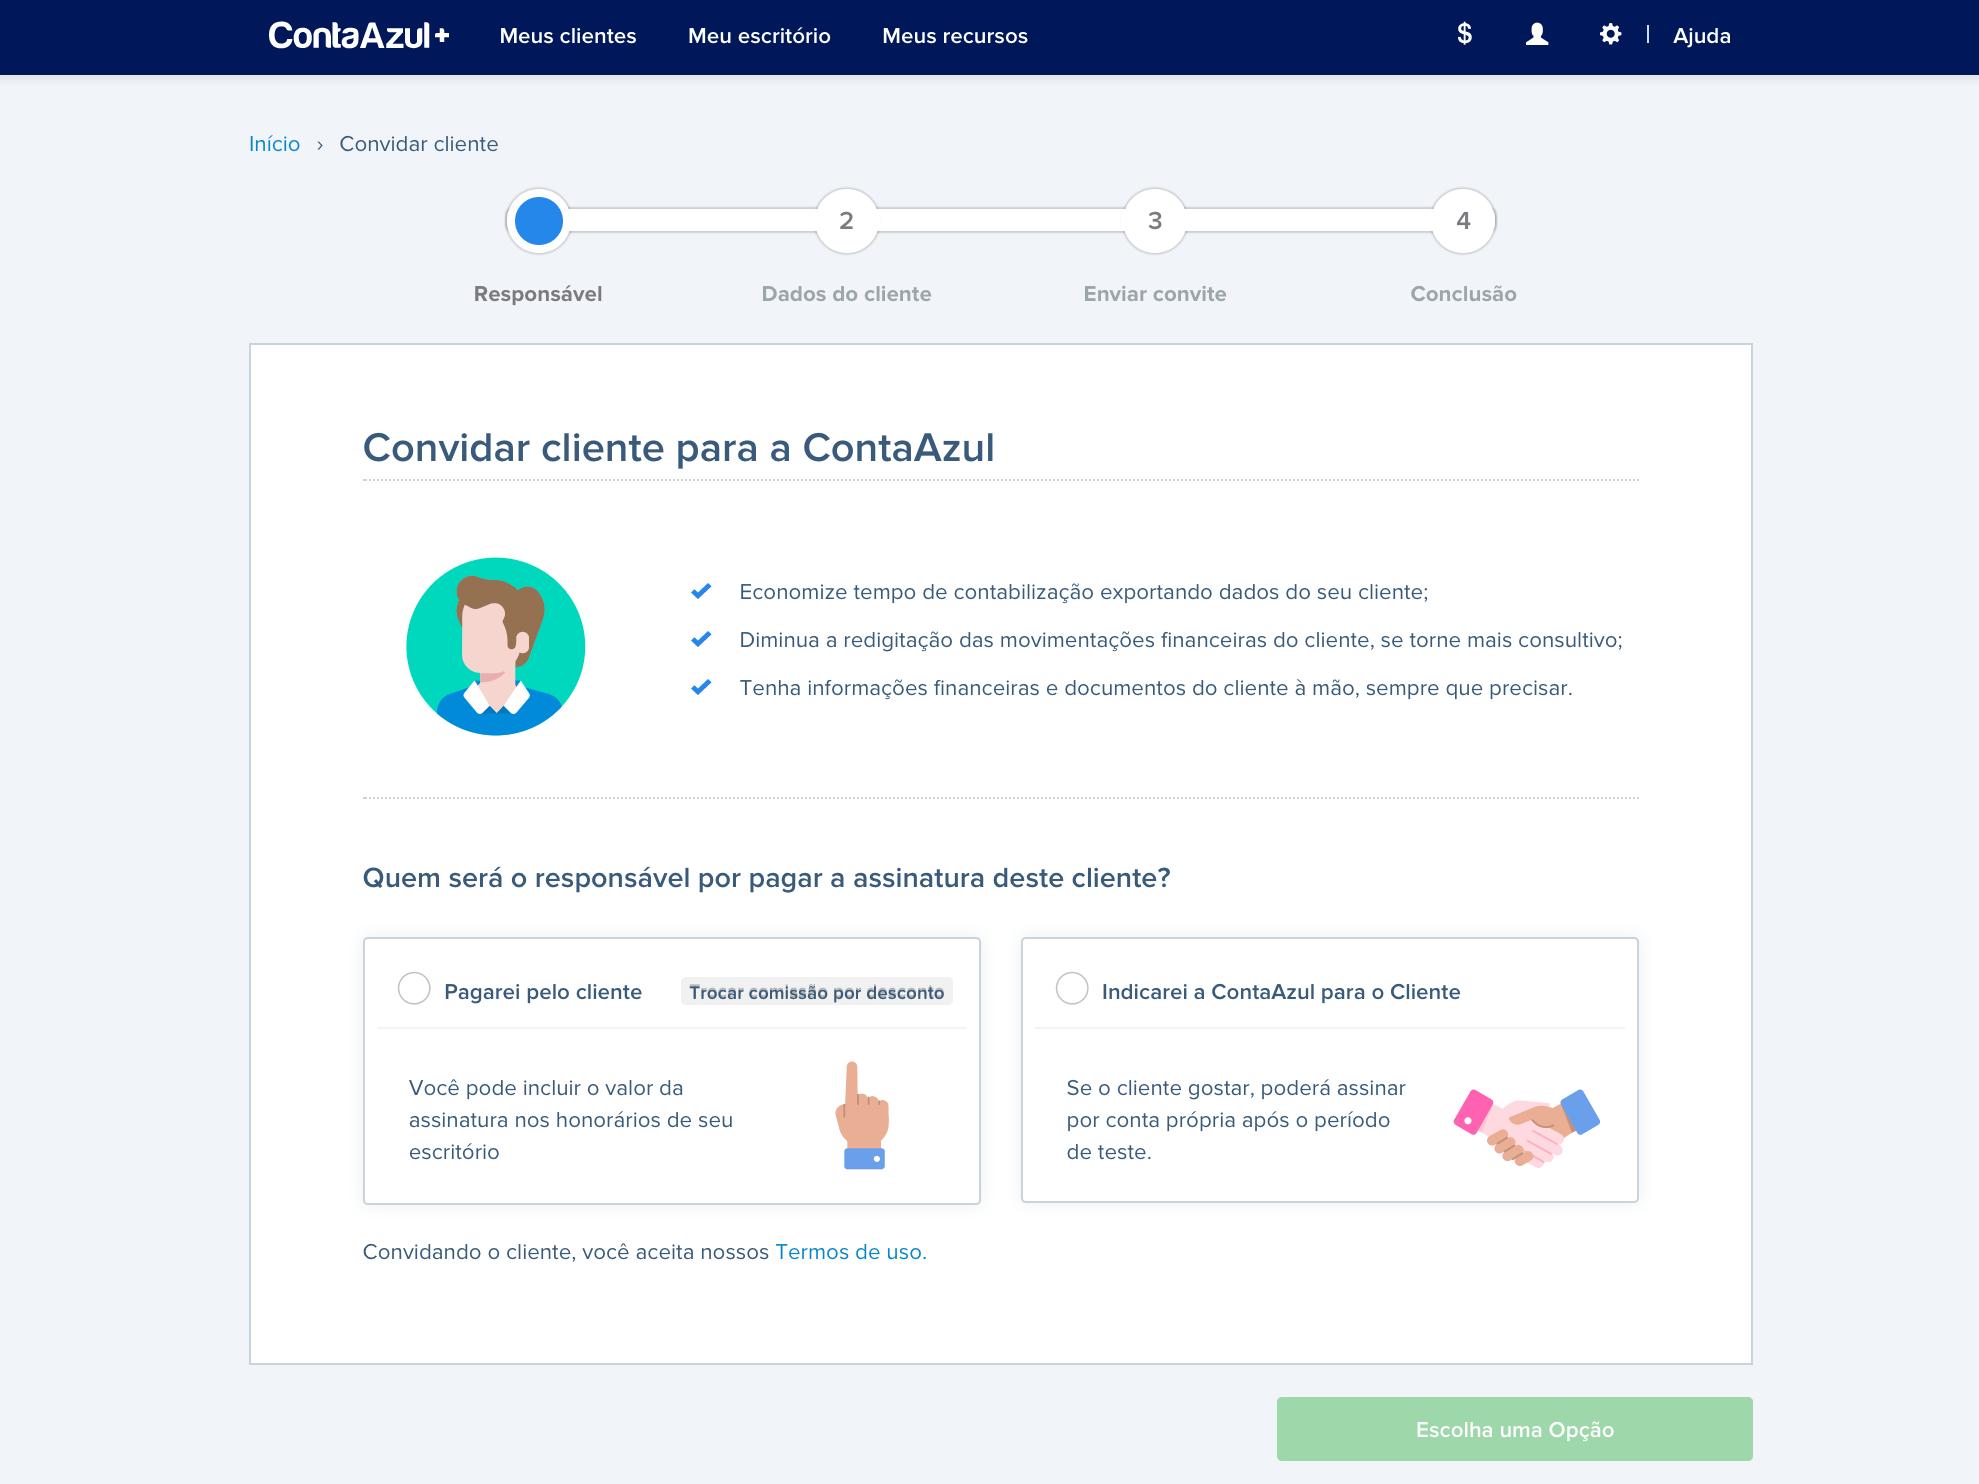 Screencapture projetos contaazul design projetos bab 23 new invite 1 0 html 2019 05 26 19 51 03